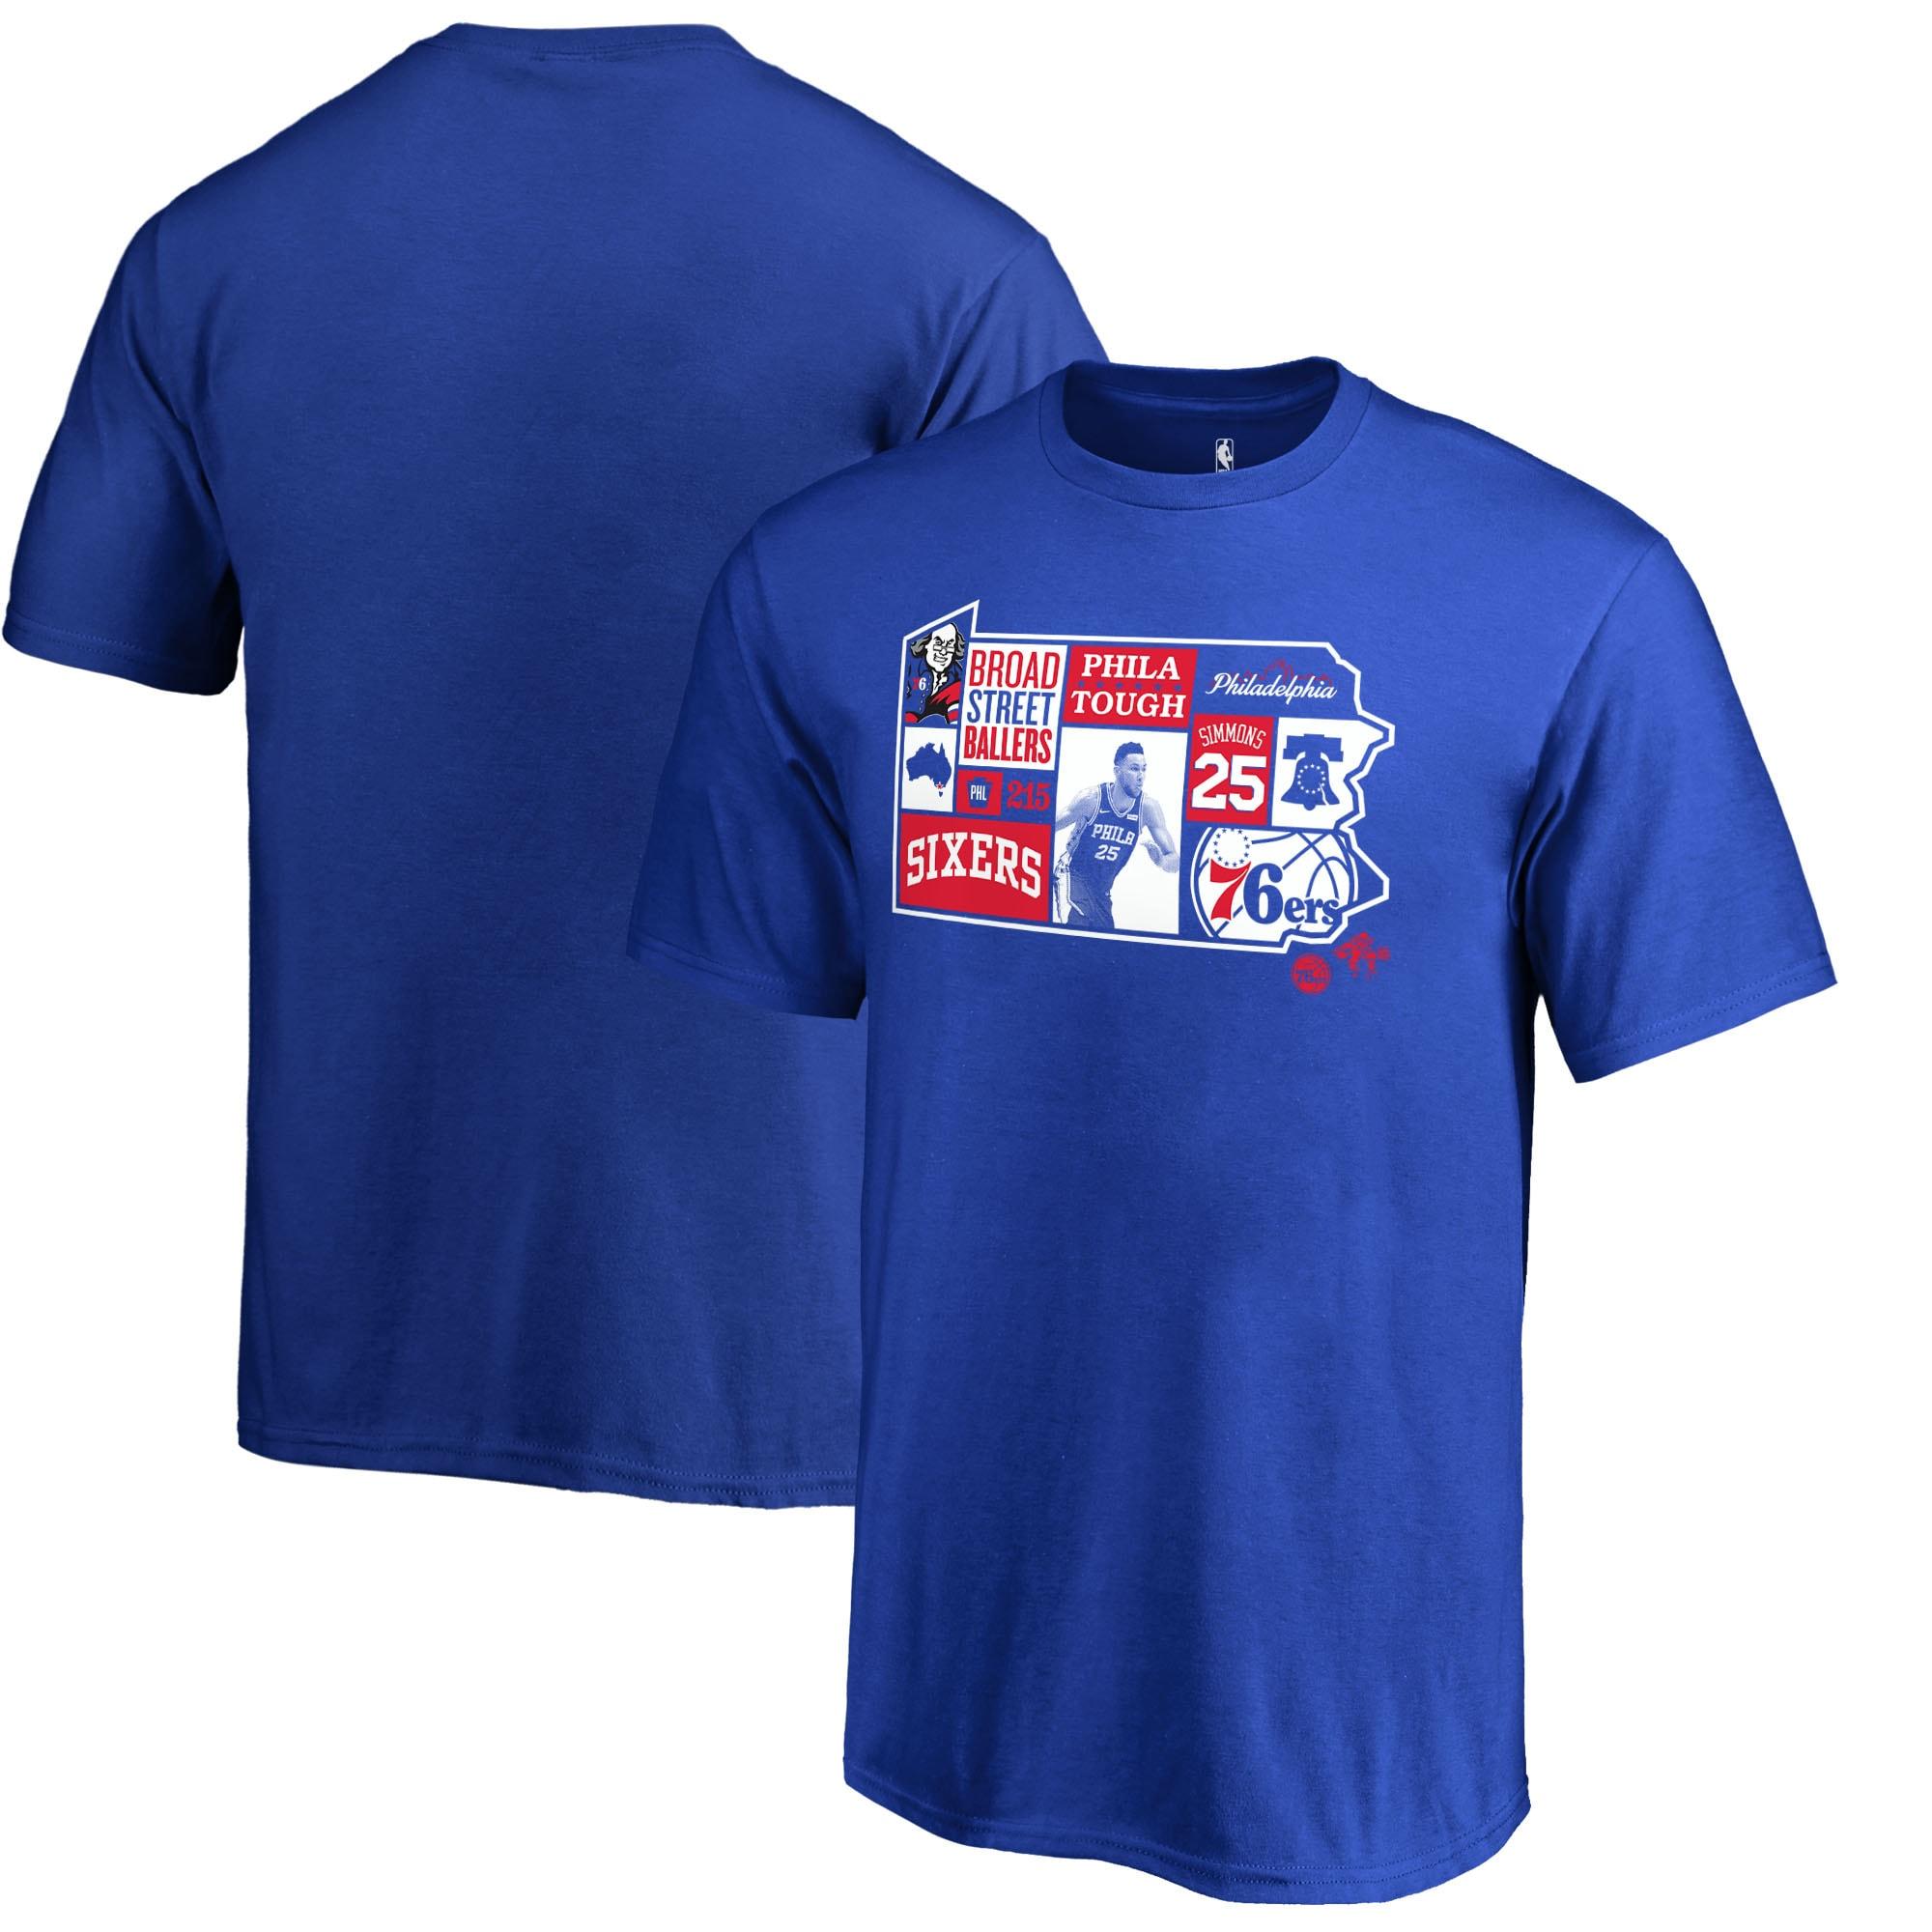 Ben Simmons Philadelphia 76ers Fanatics Branded Youth Player State T-Shirt - Royal